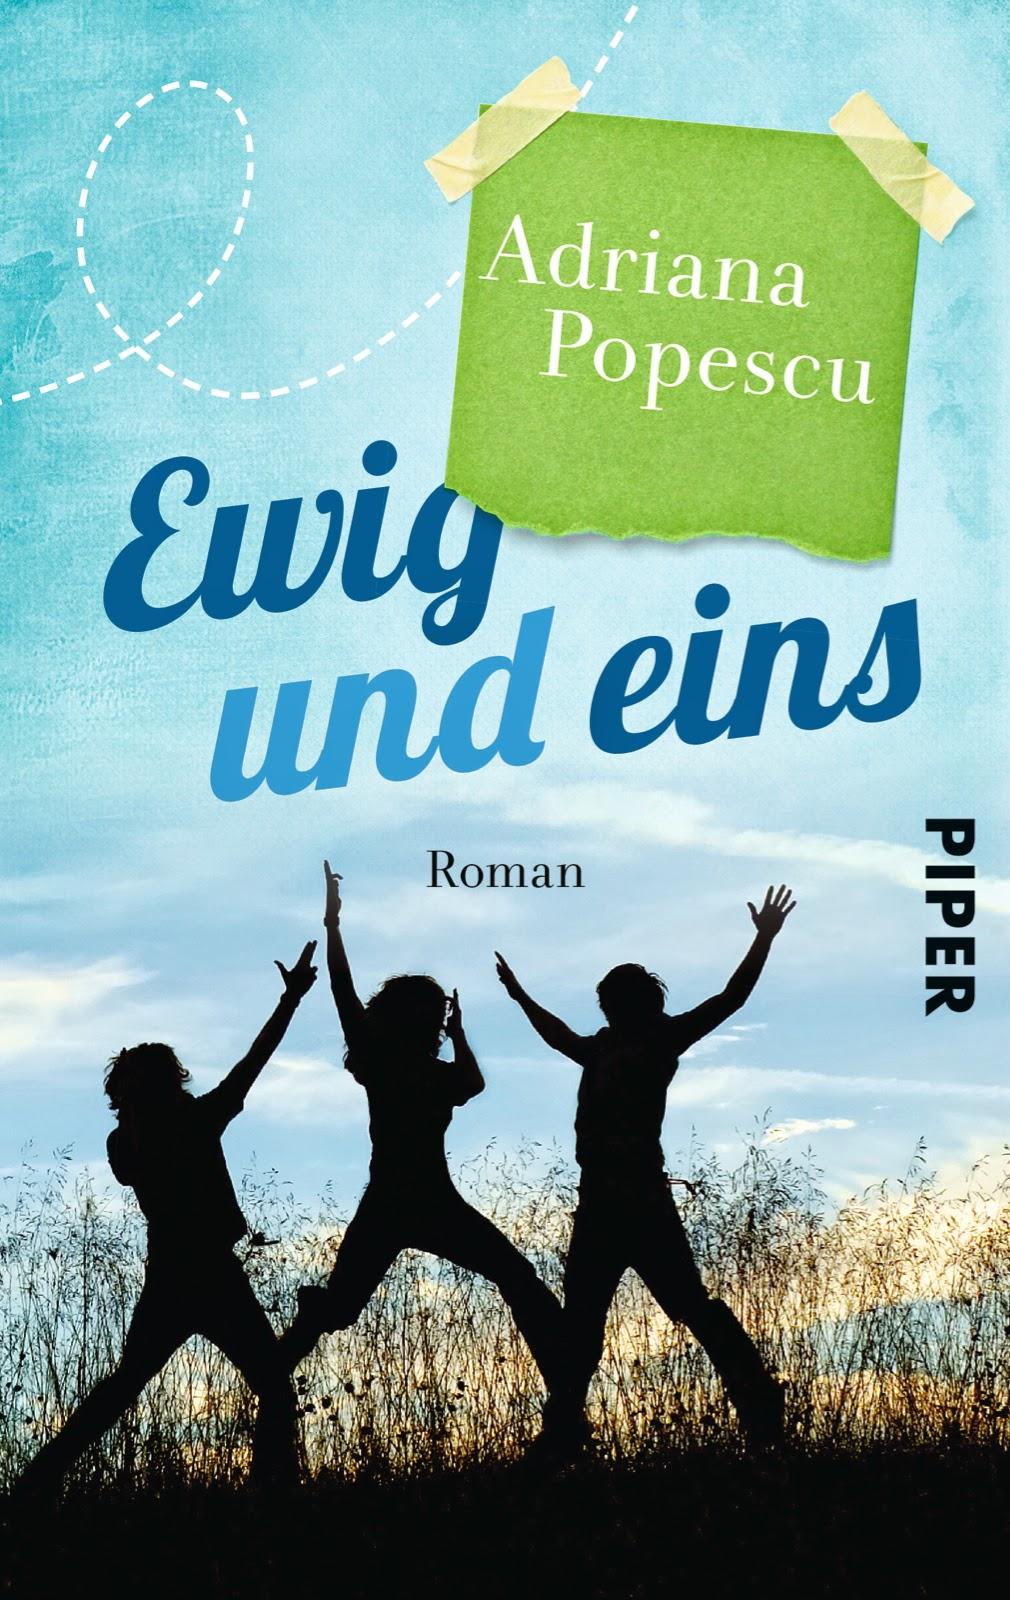 https://www.buchhaus-sternverlag.de/shop/action/productDetails/26001913/adriana_popescu_ewig_und_eins_349230656X.html?aUrl=90007403&searchId=65